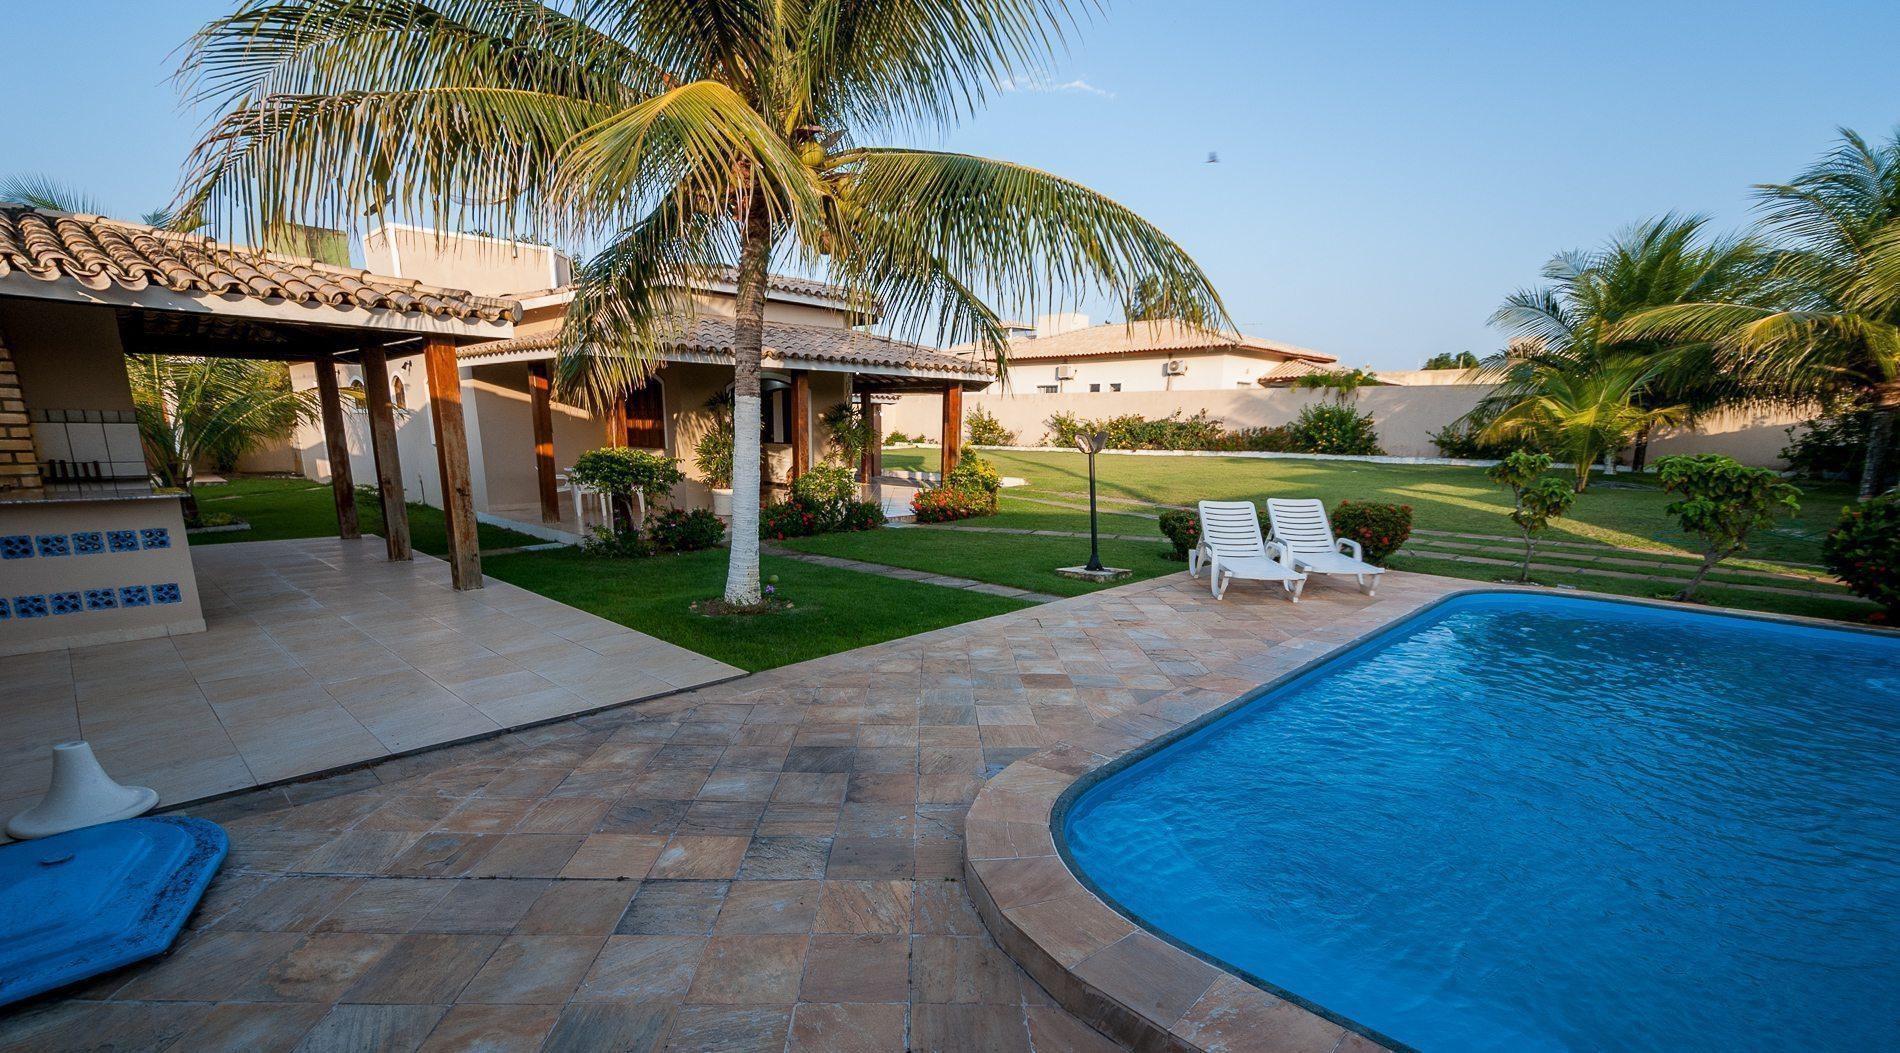 Casa com piscina barra do jacu pe hansen im veis for Casas con piscina bucaramanga